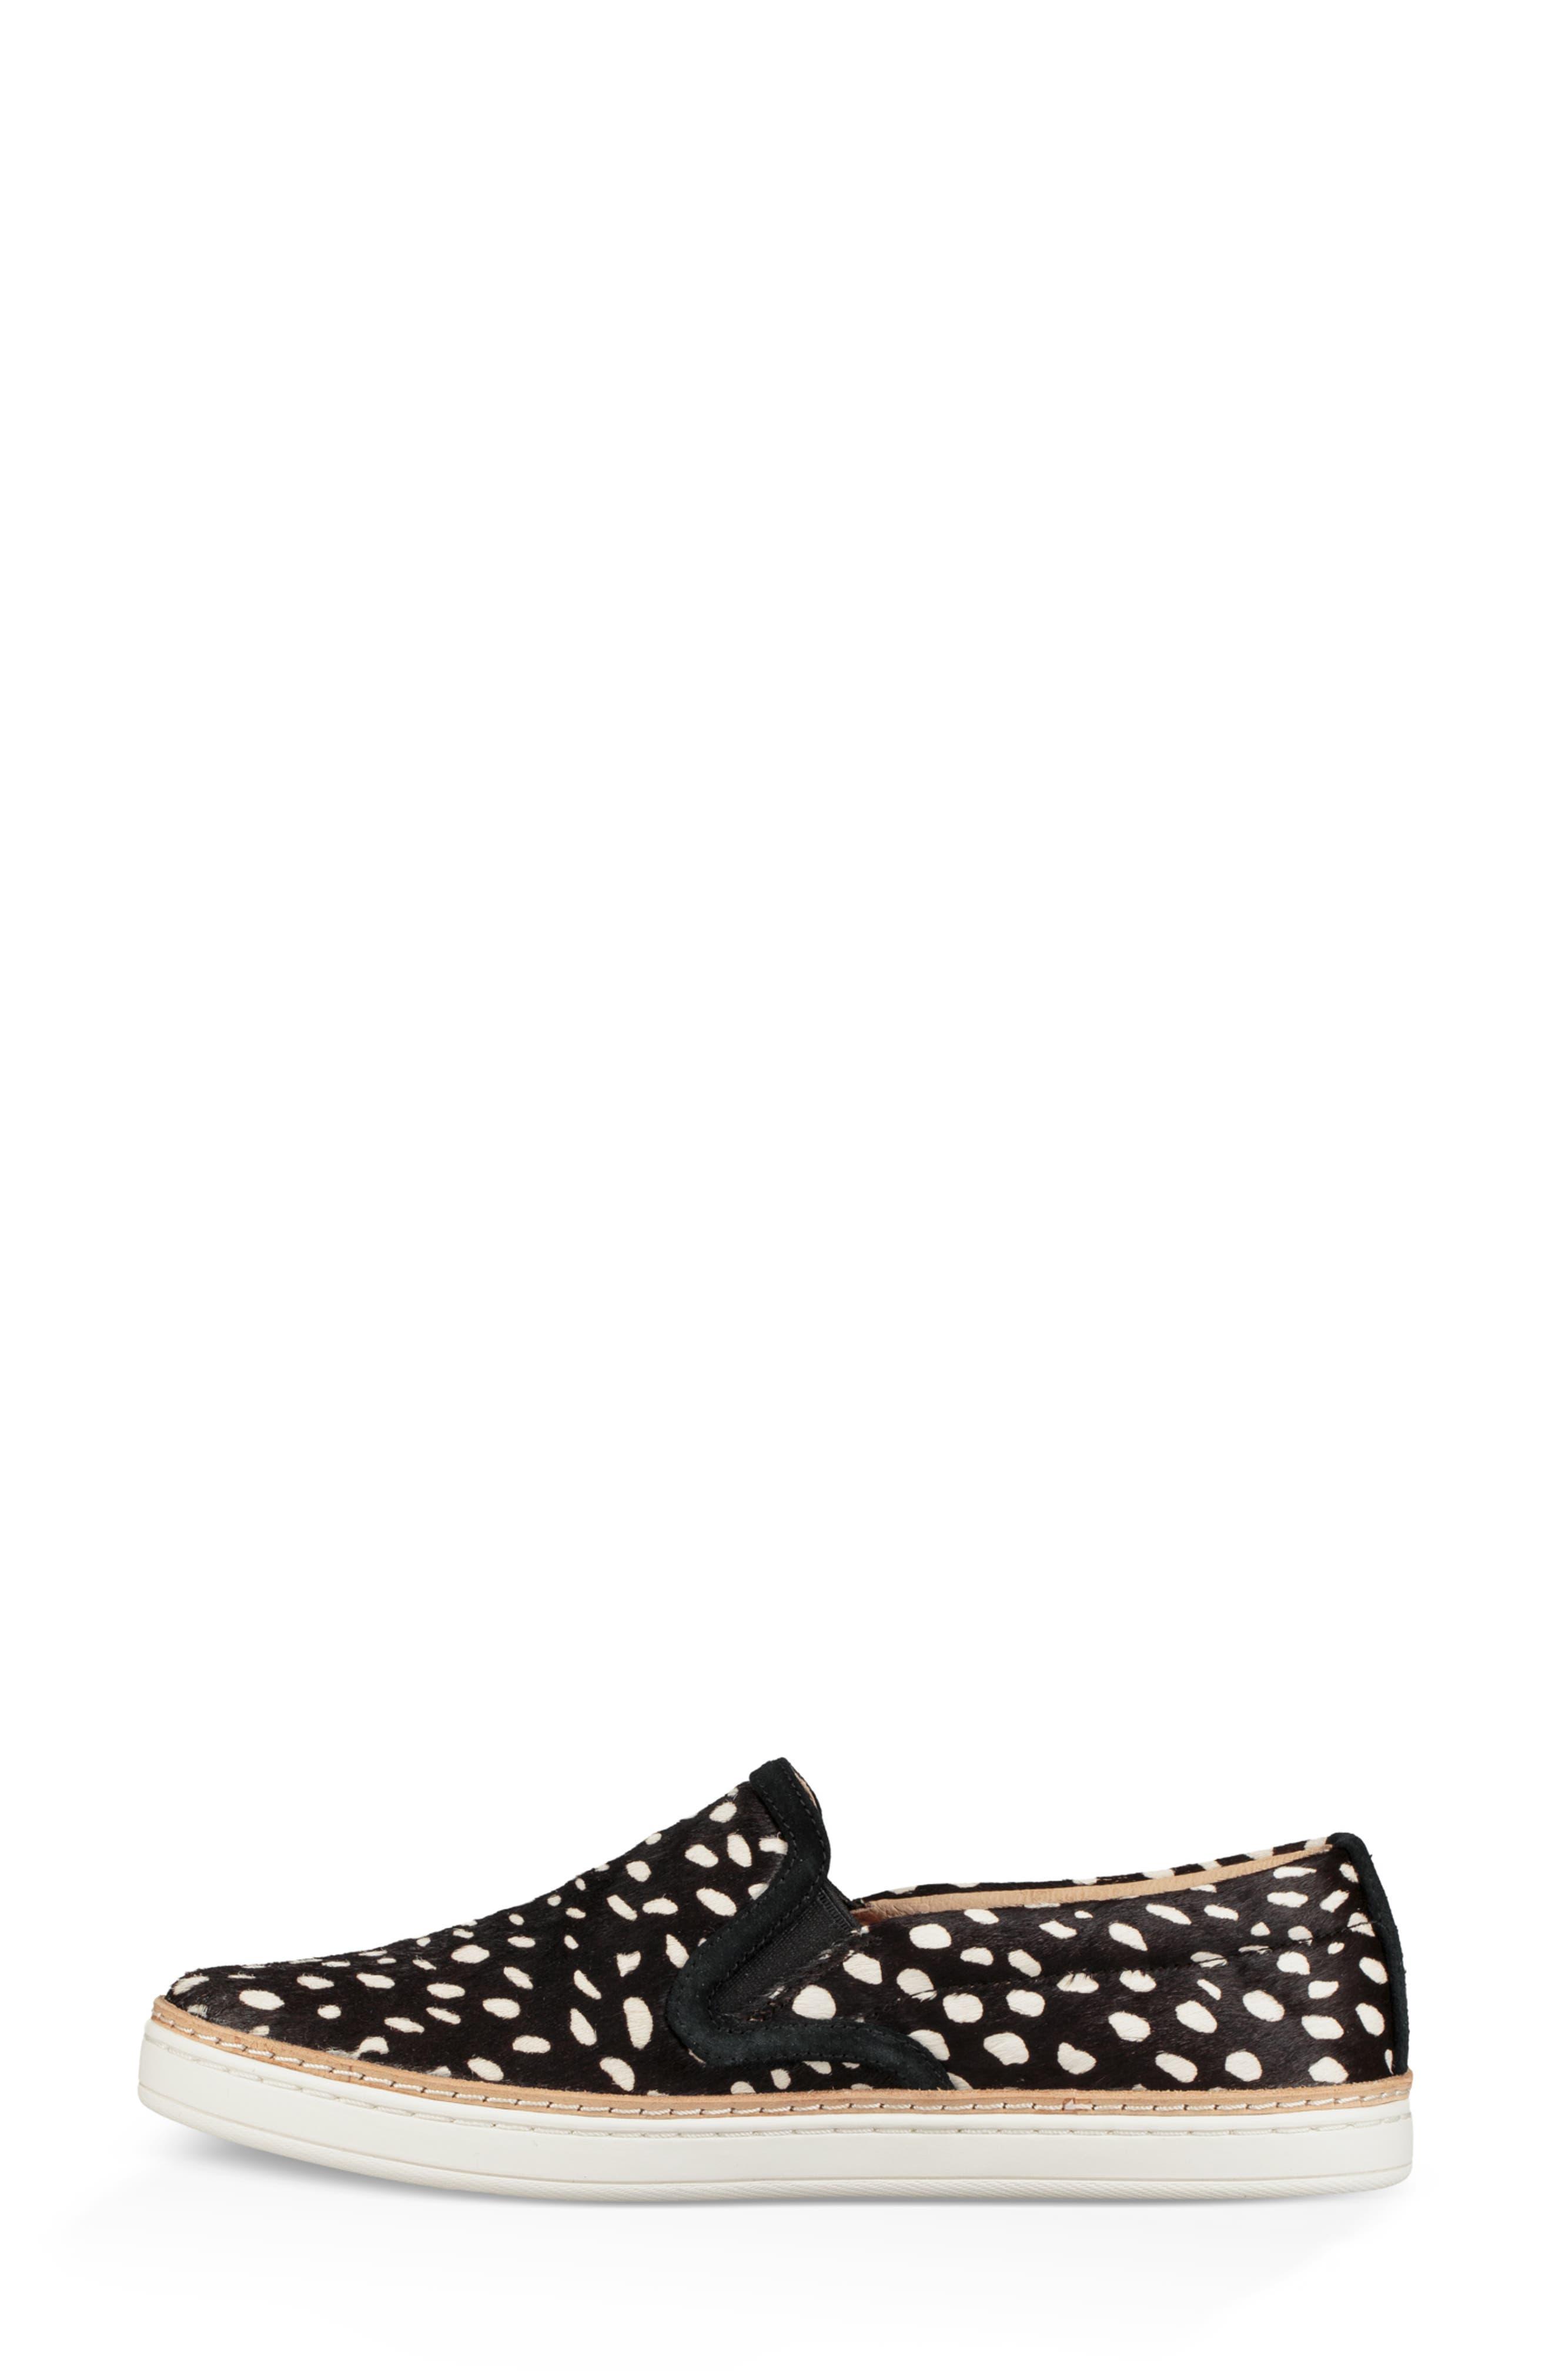 Soleda Genuine Calf Hair Slip-On Sneaker,                             Alternate thumbnail 6, color,                             BLACK